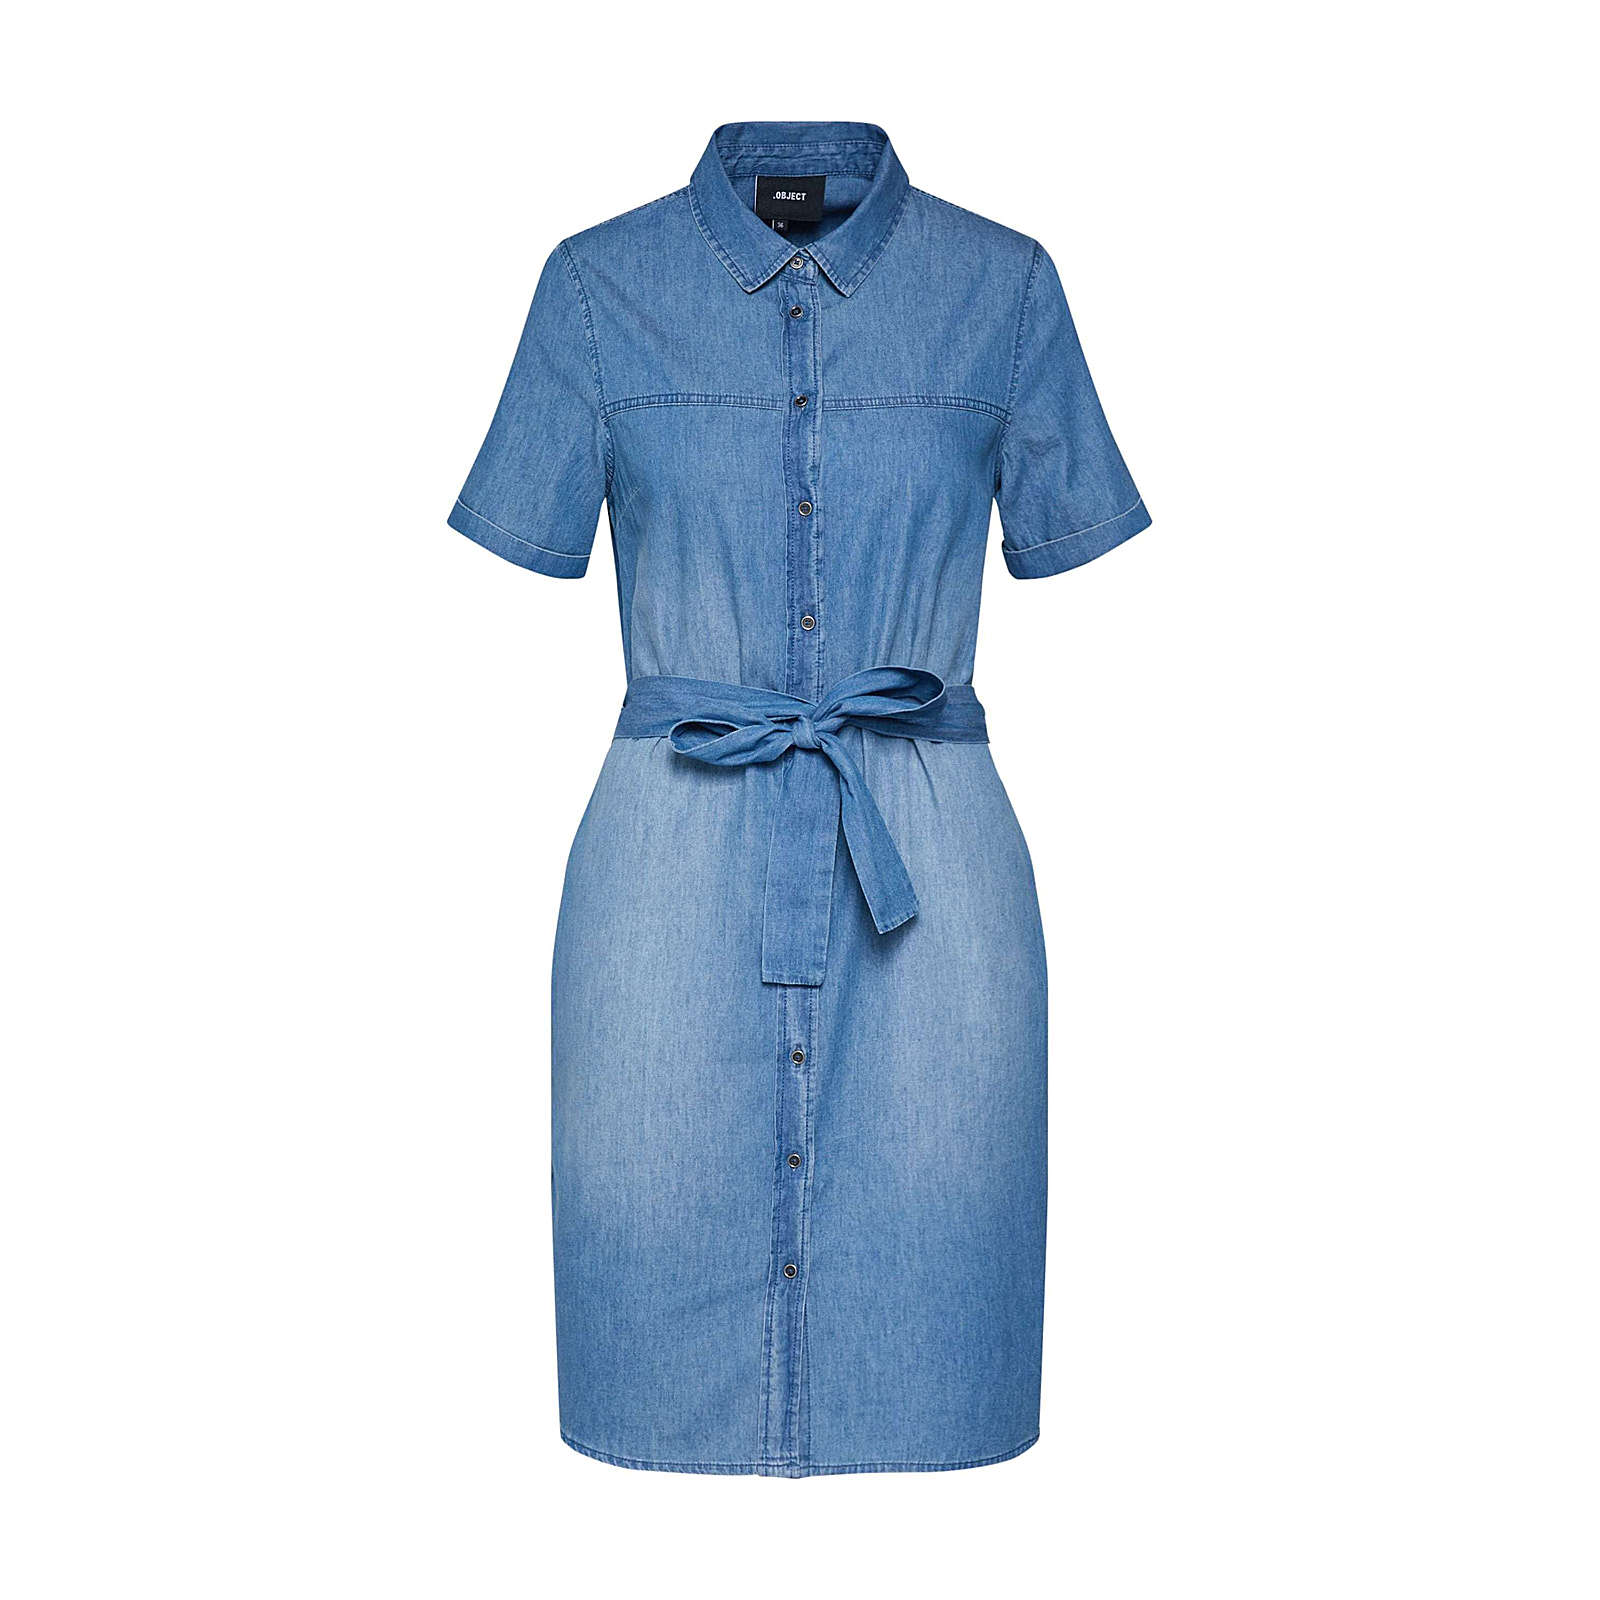 OBJECT Kleid CAMILLA Jeanskleider blue denim Damen Gr. 38